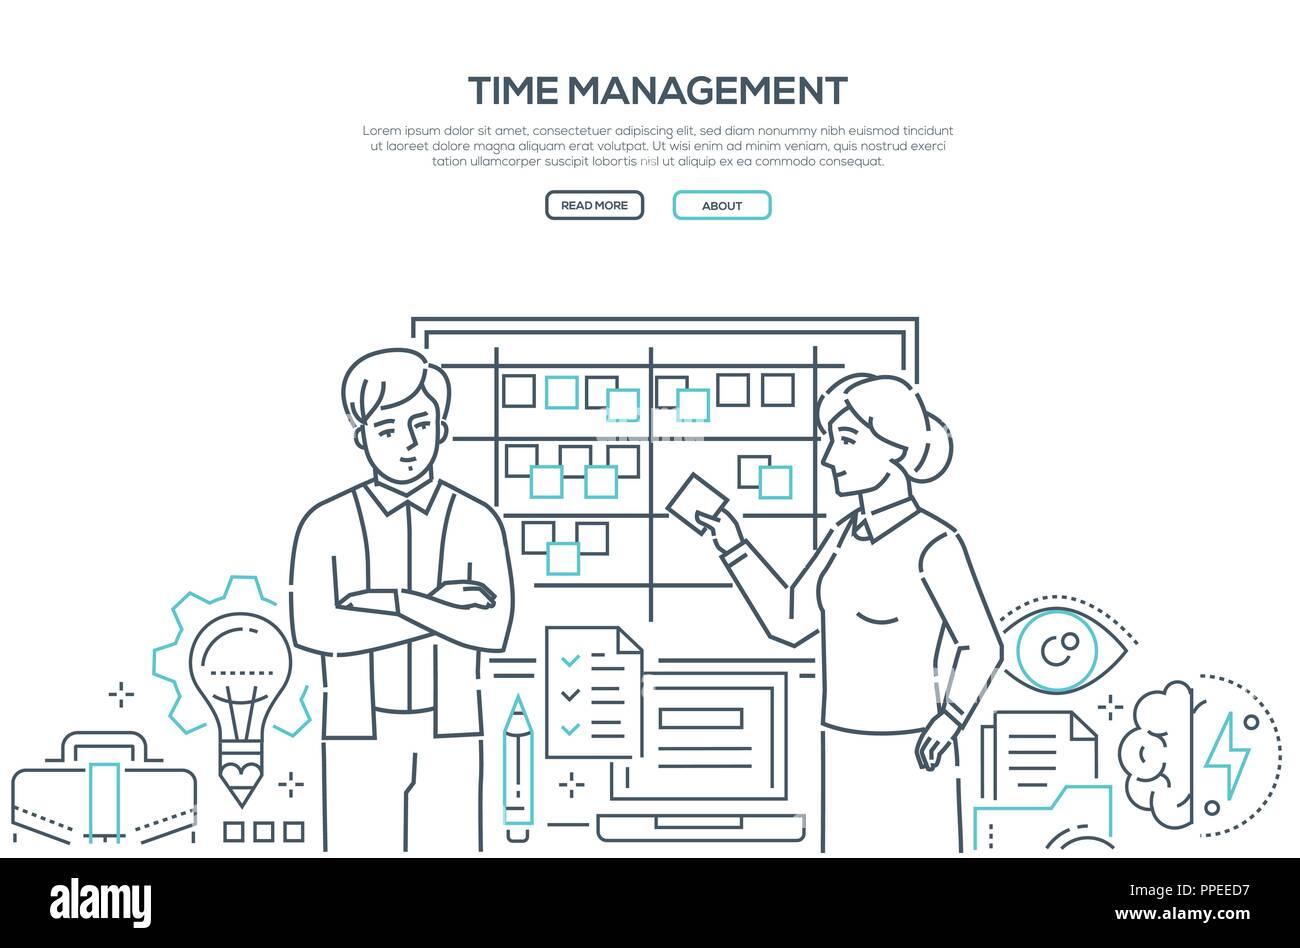 Time Management Modern Line Design Style Banner Stock Vector Image Art Alamy